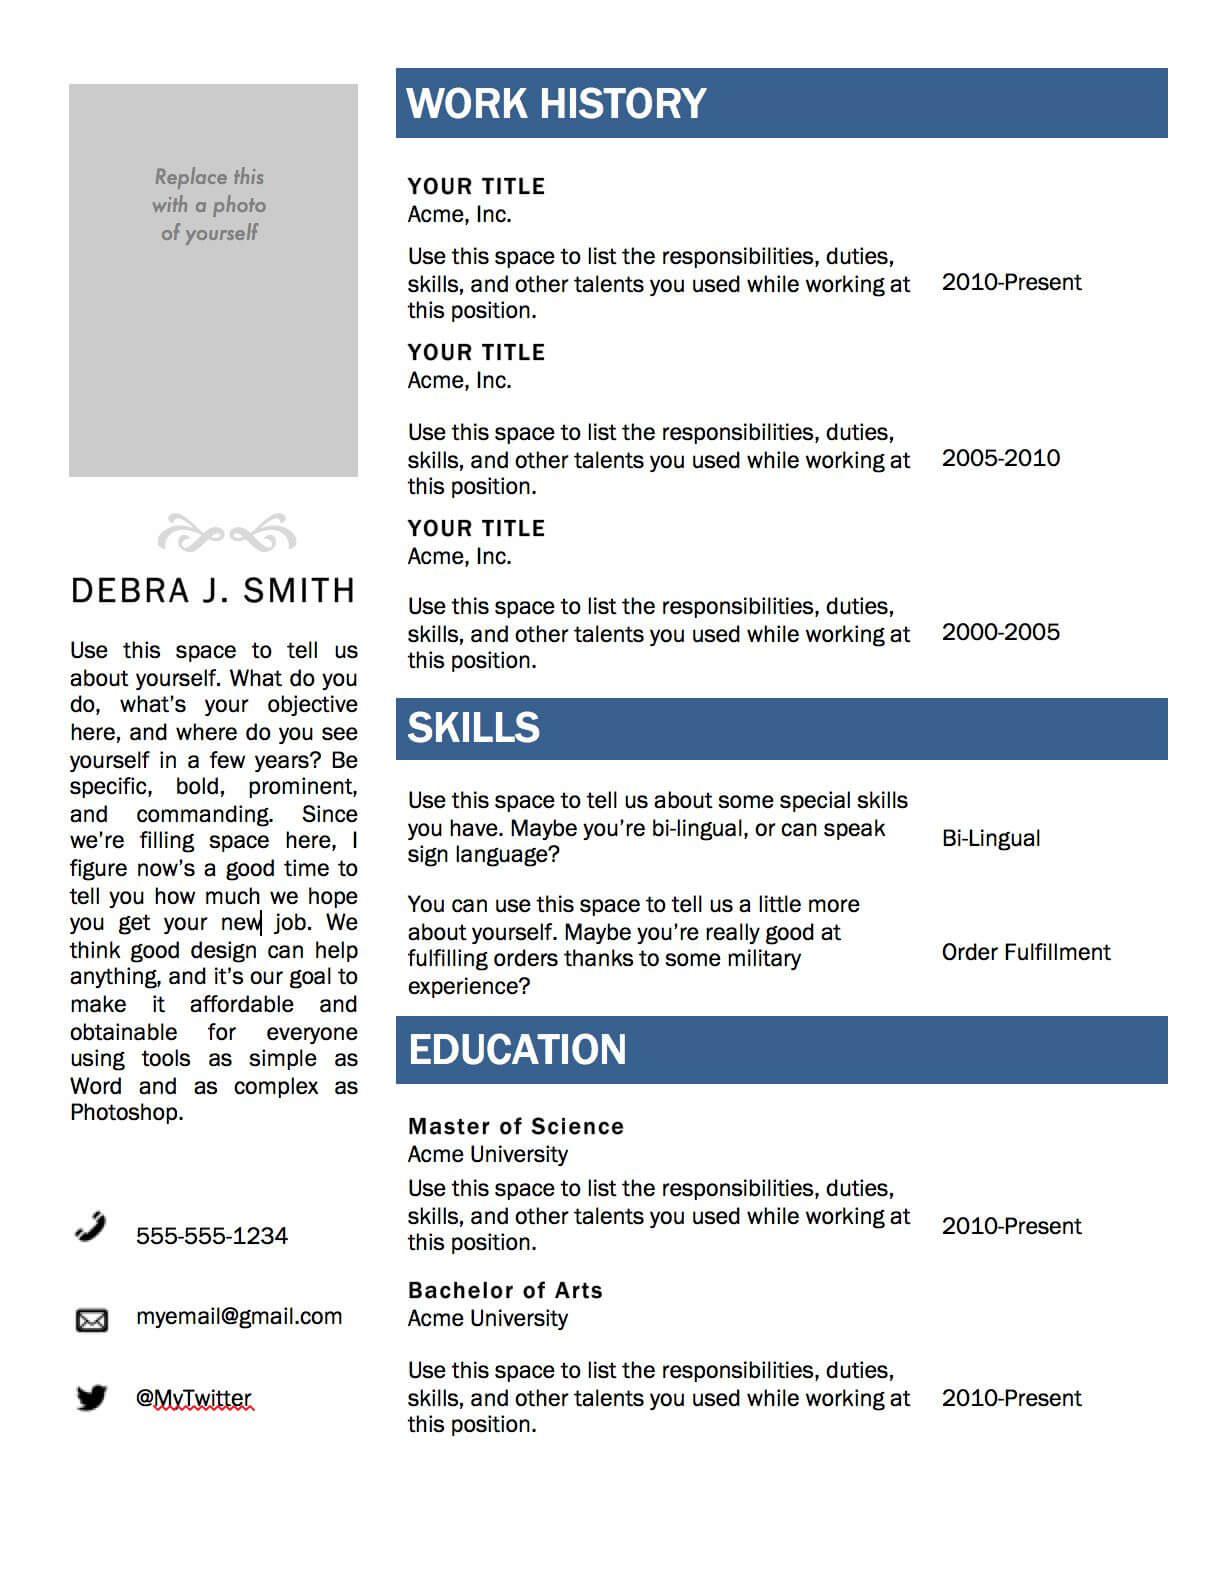 Free Microsoft Word Resume Template   Microsoft Resume With Regard To Resume Templates Word 2010